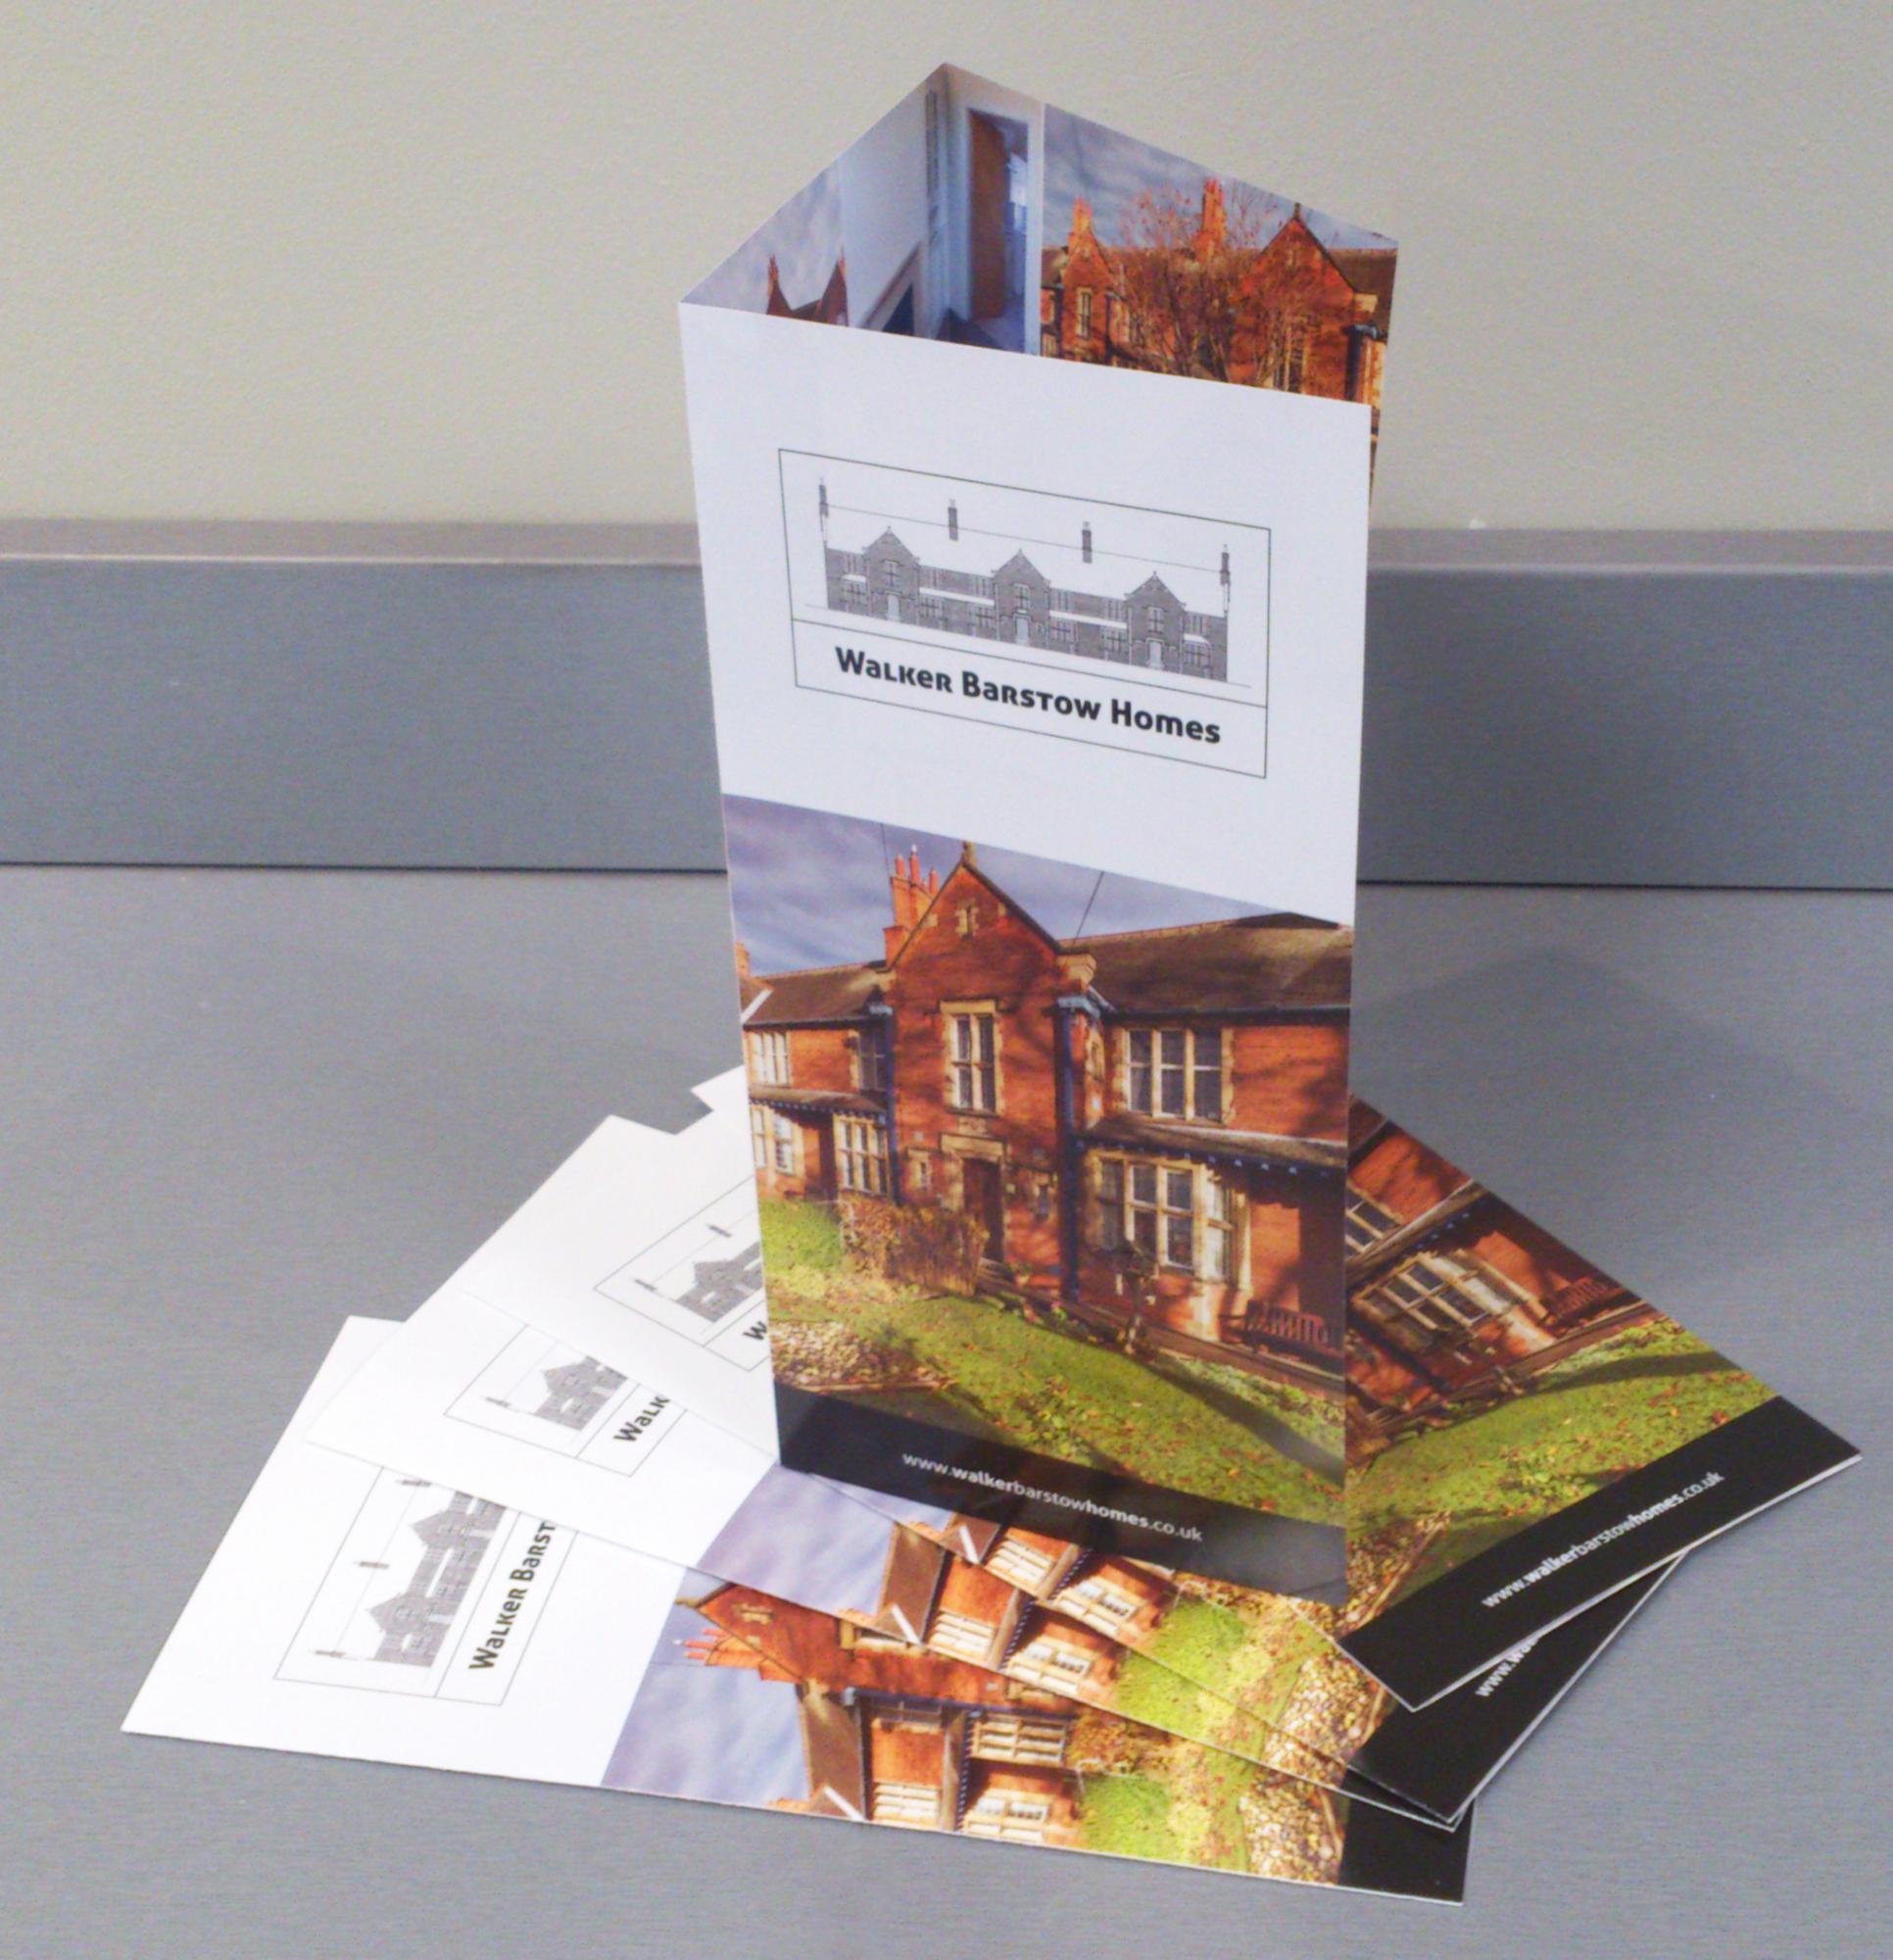 Walker Barstow Homes brochure